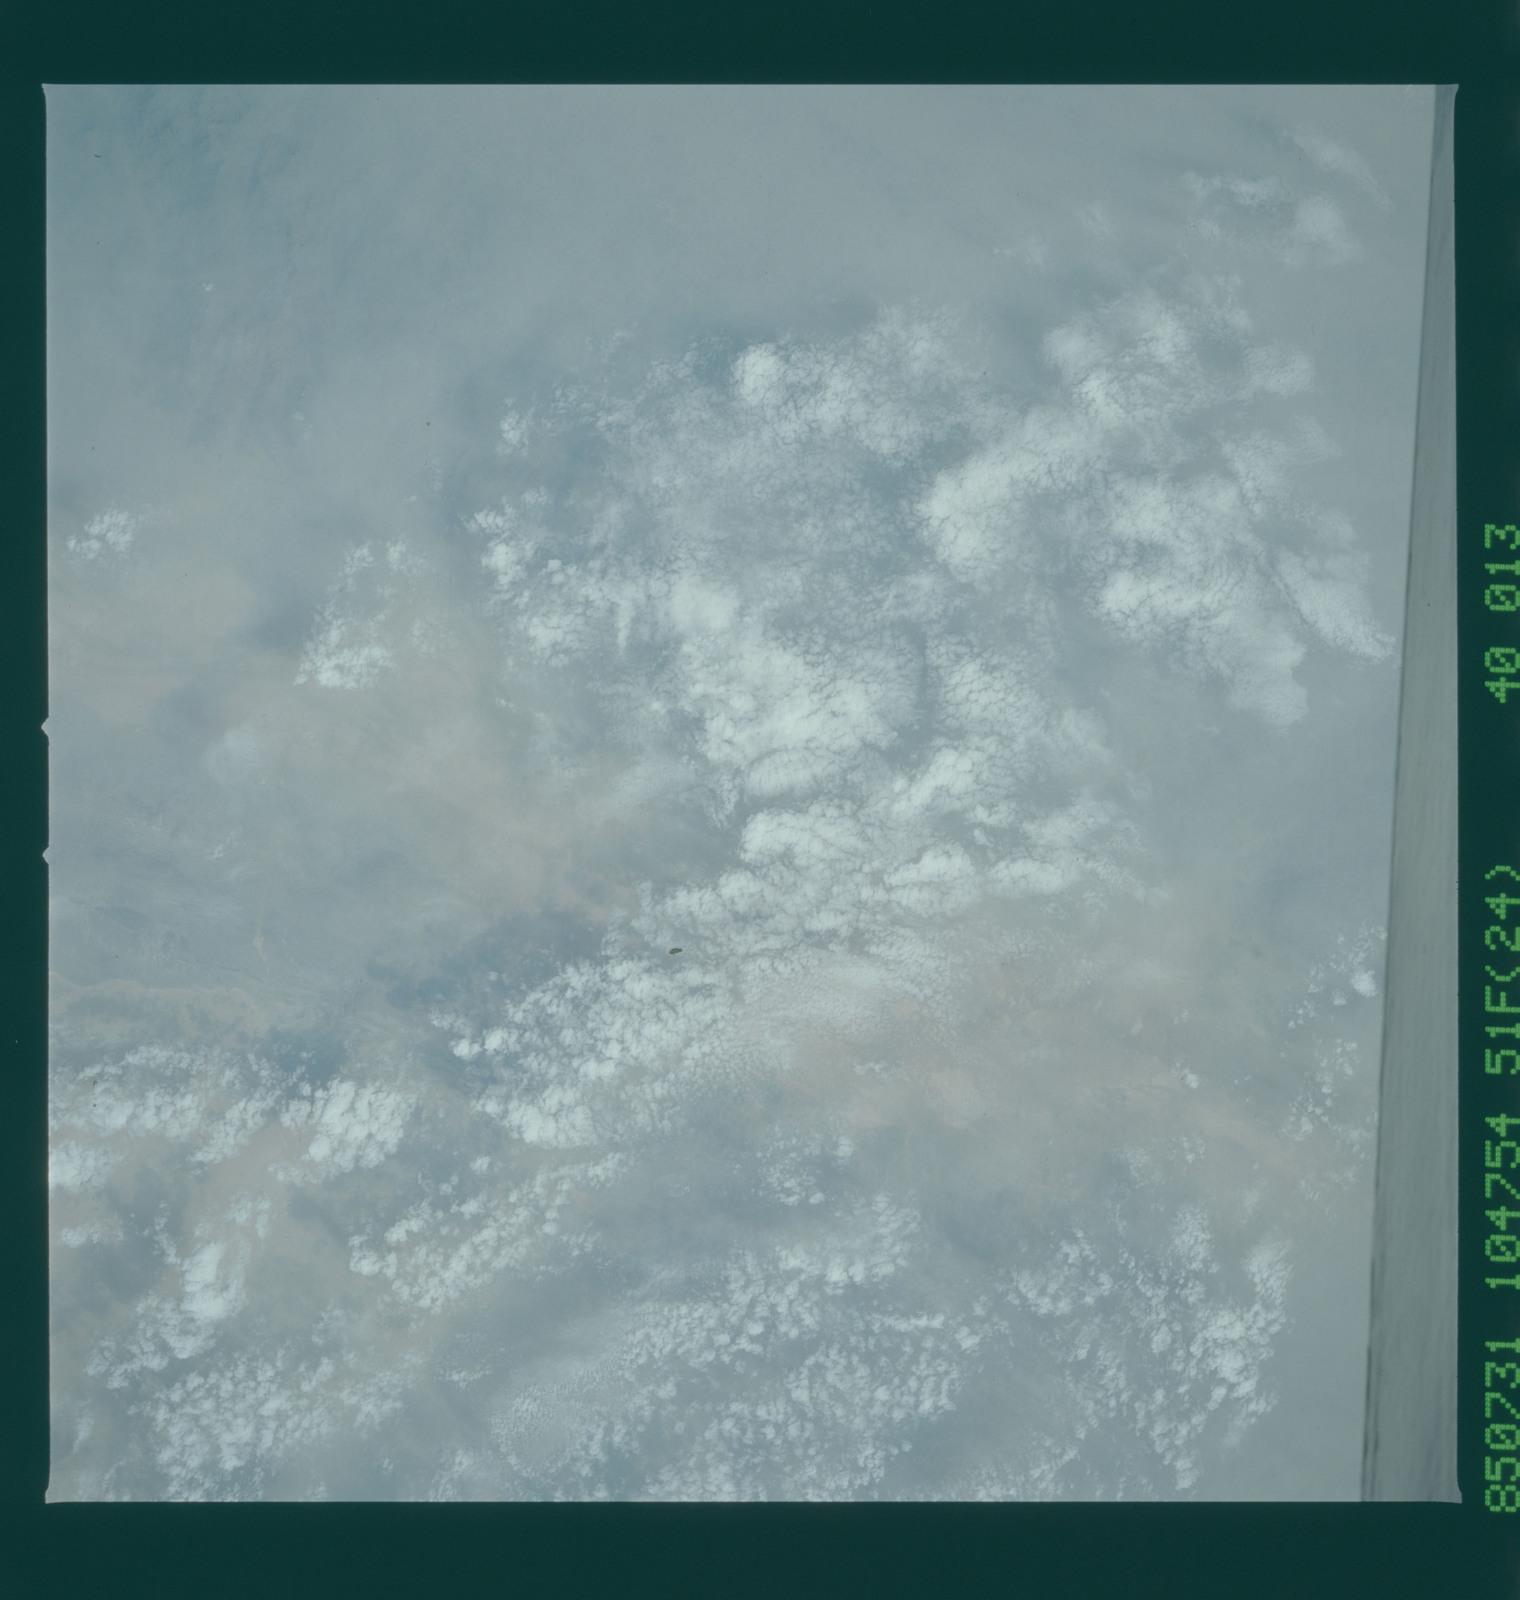 51F-40-013 - STS-51F - 51F earth observations